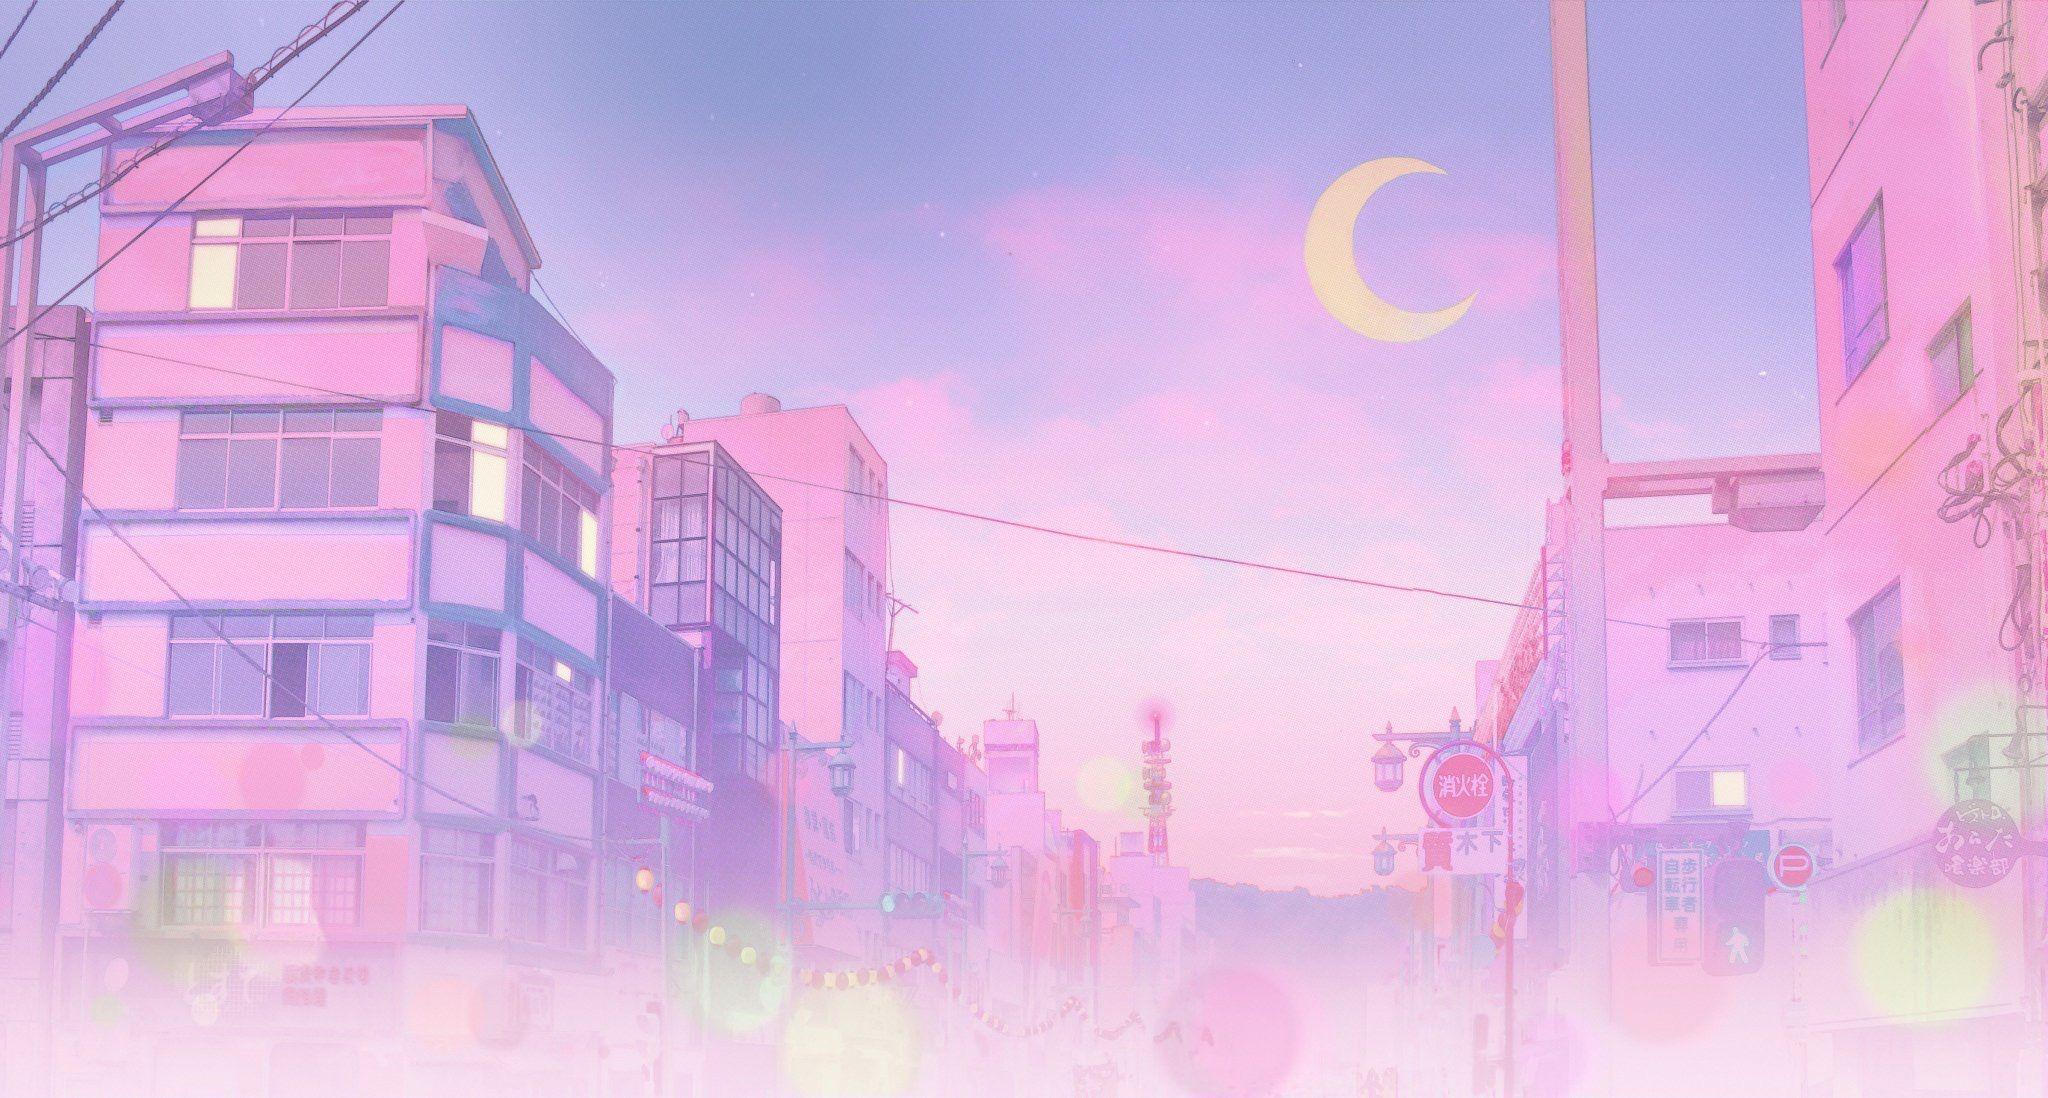 Pink Anime Aesthetic Desktop Wallpapers Wallpaper Cave